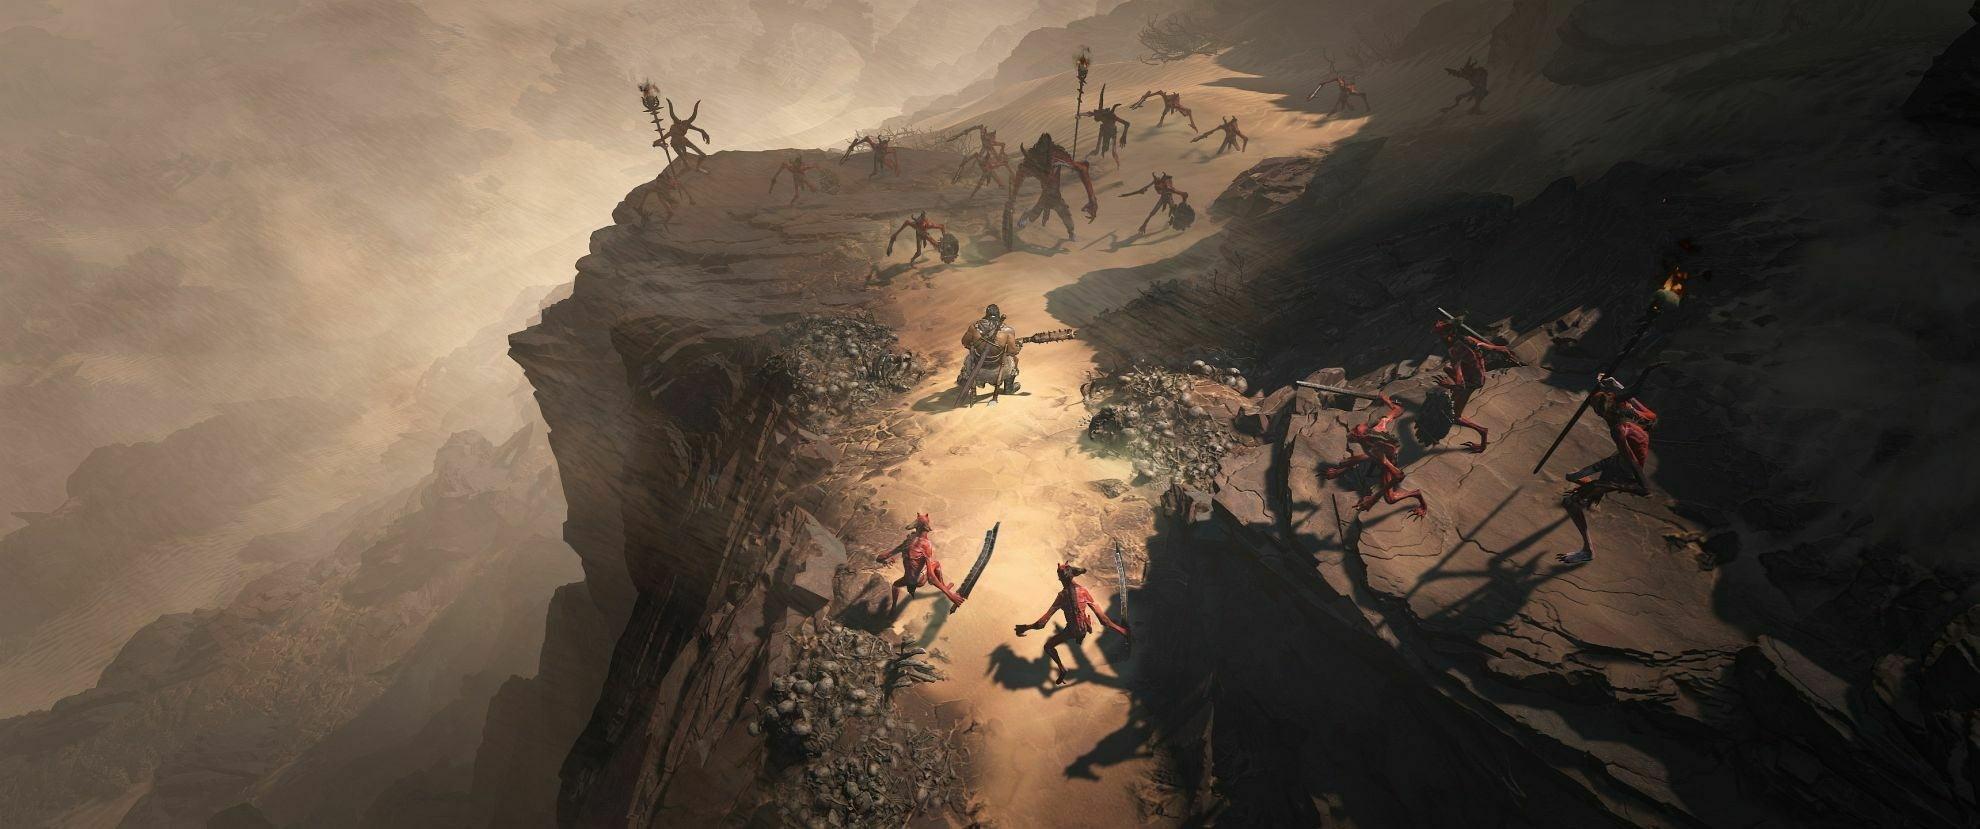 Почти два часа геймплея демо Diablo IV с BlizzCon 2019